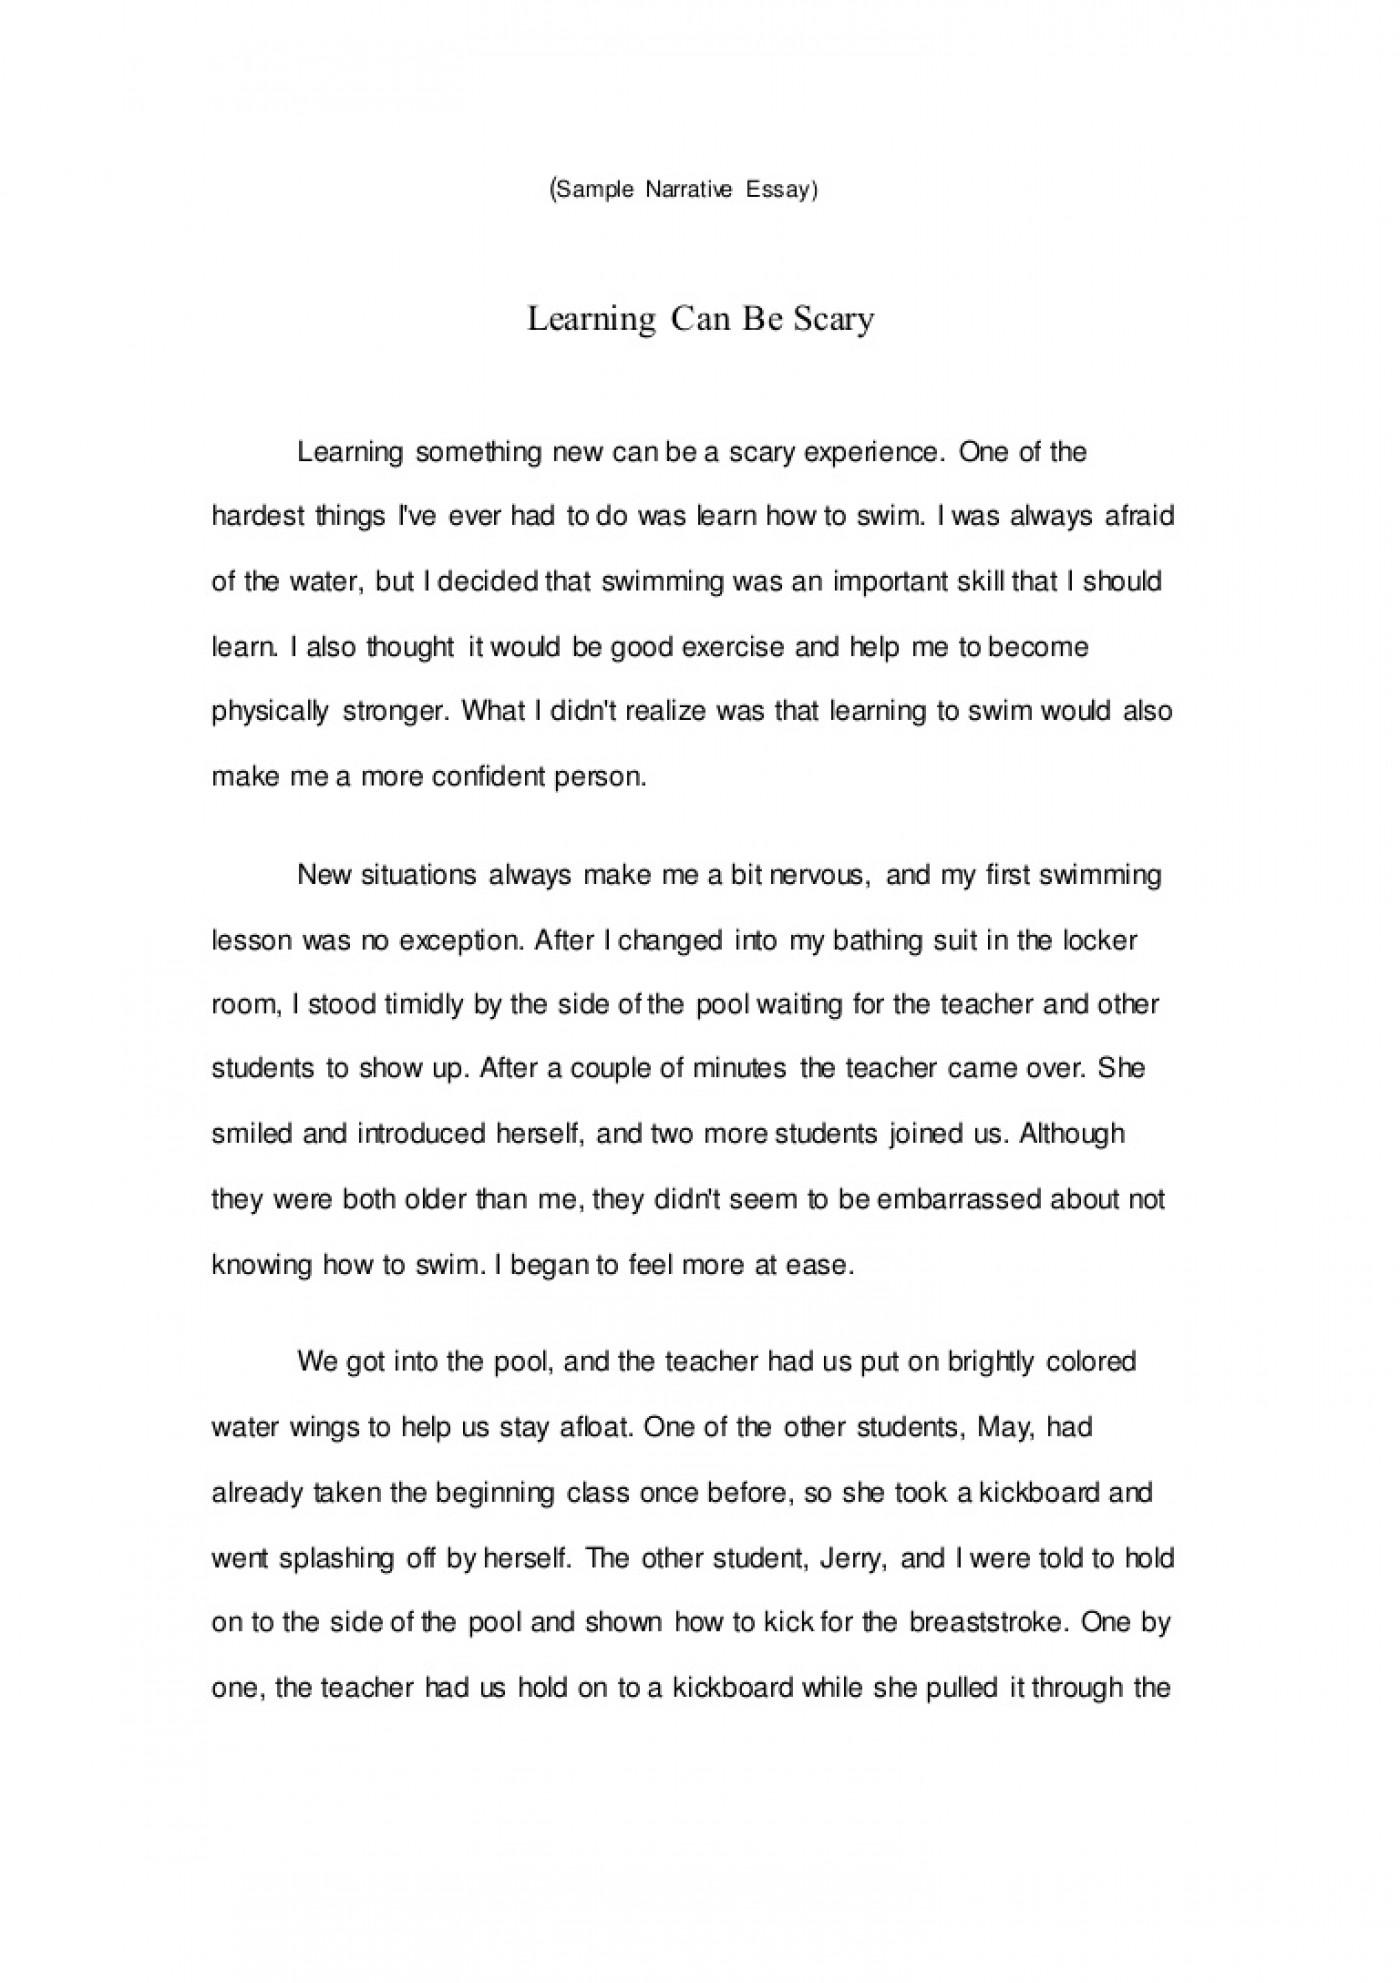 008 Sample Narrative Essay Samplenarrativeessay Lva1 App6891 Thumbnail Wondrous College High School Samples Of Essays Level 1400